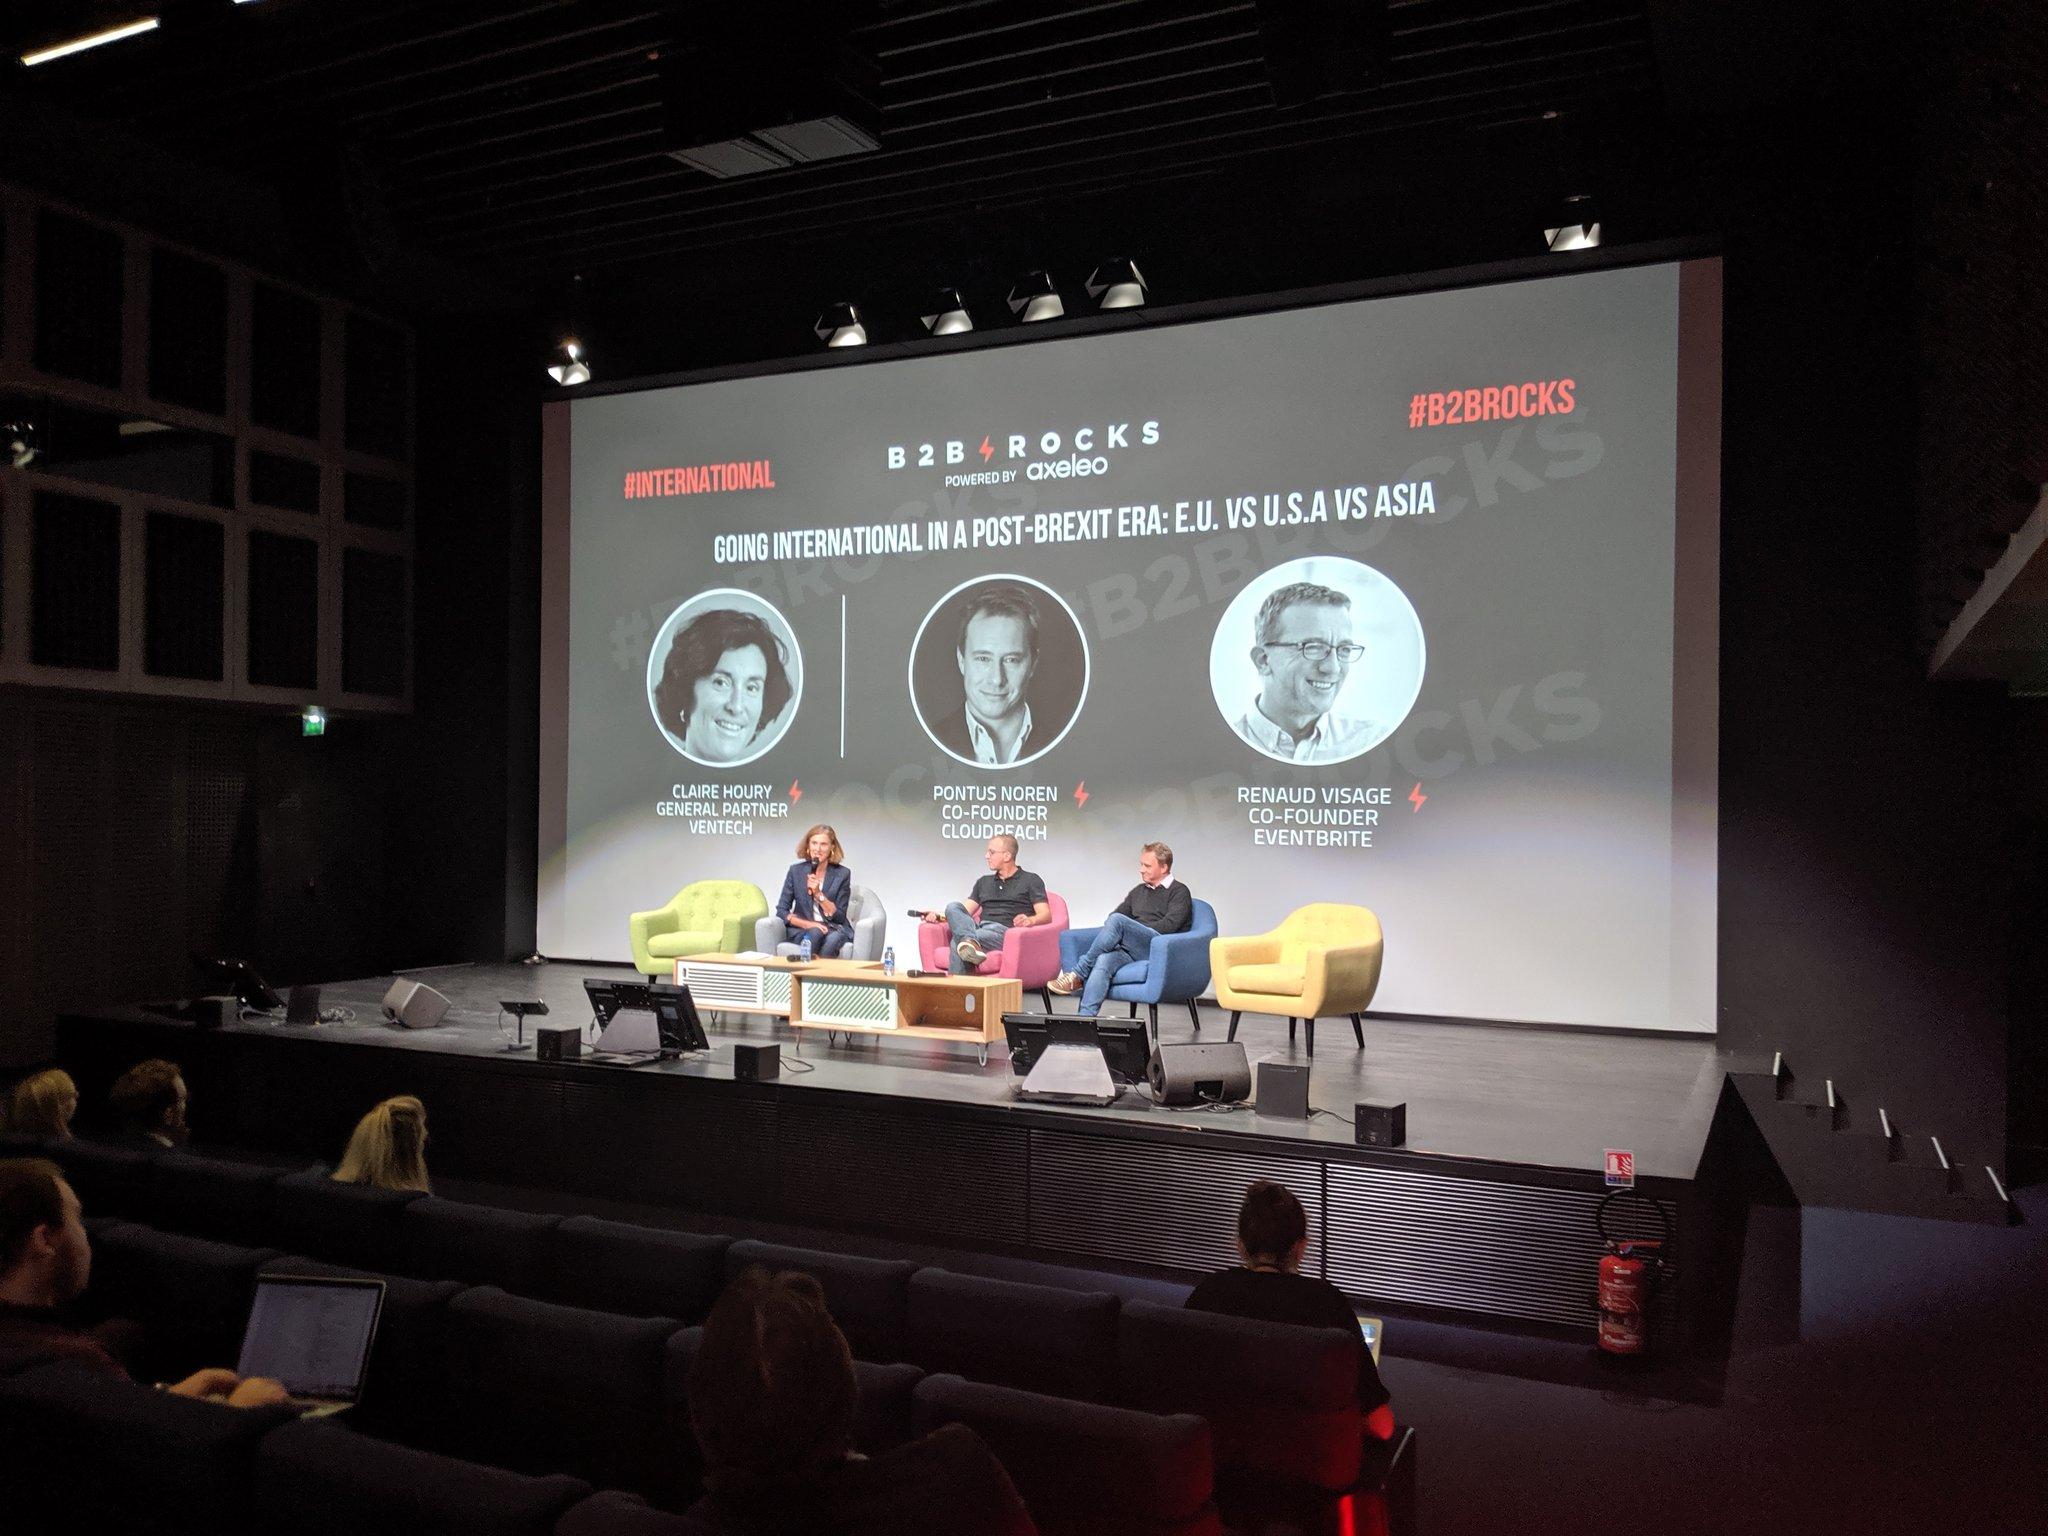 B2B Rocks Paris 2019 conference